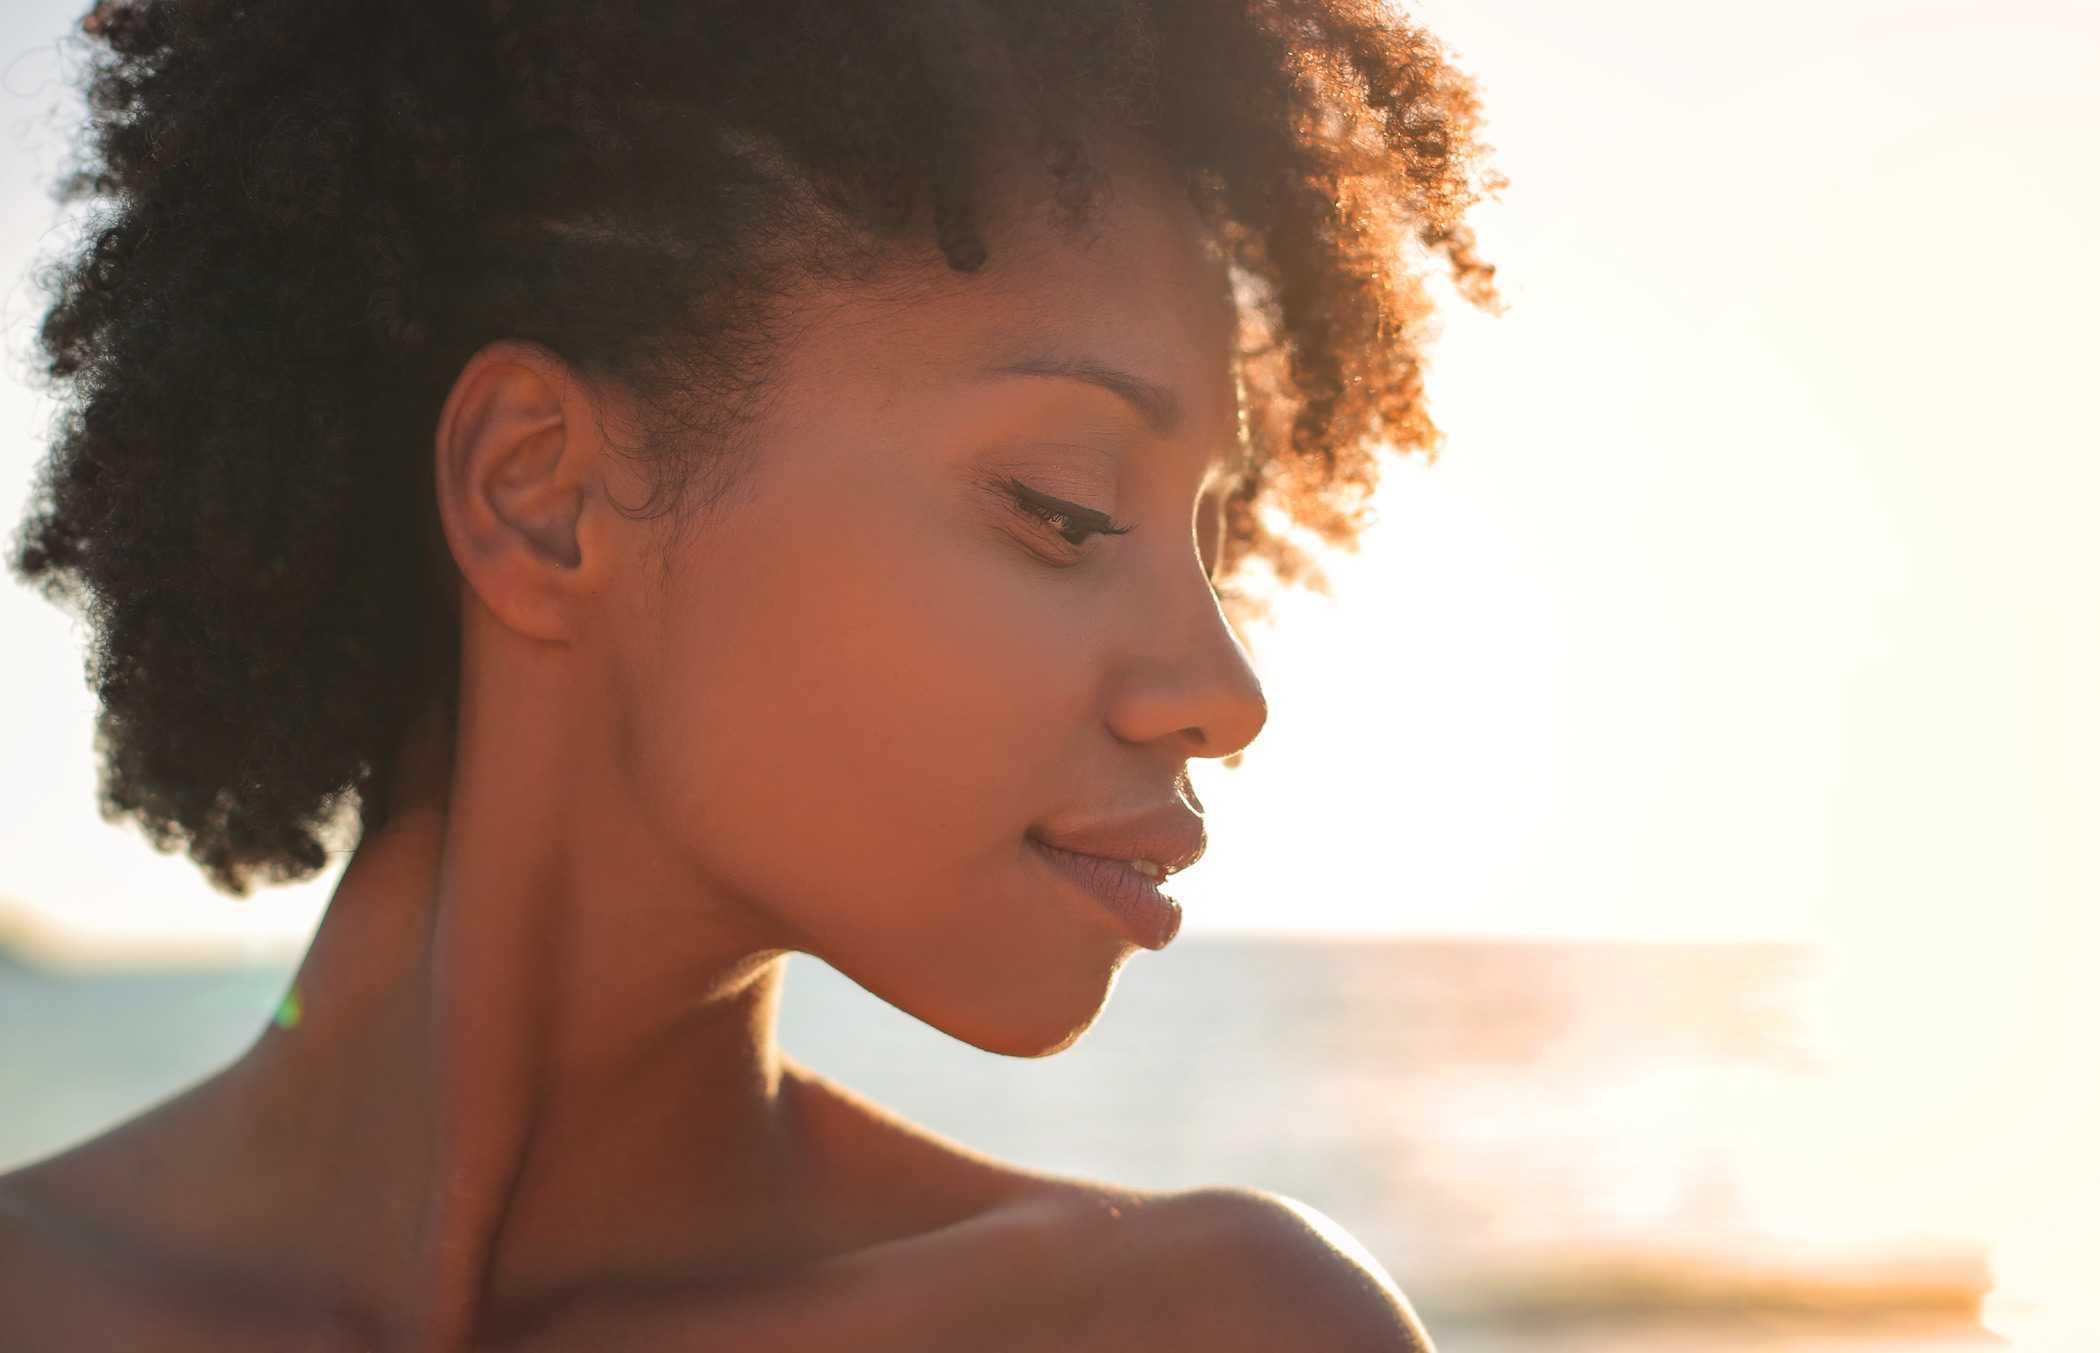 Heavenly-Spa-Westin-Savannah-Facial-Treatments